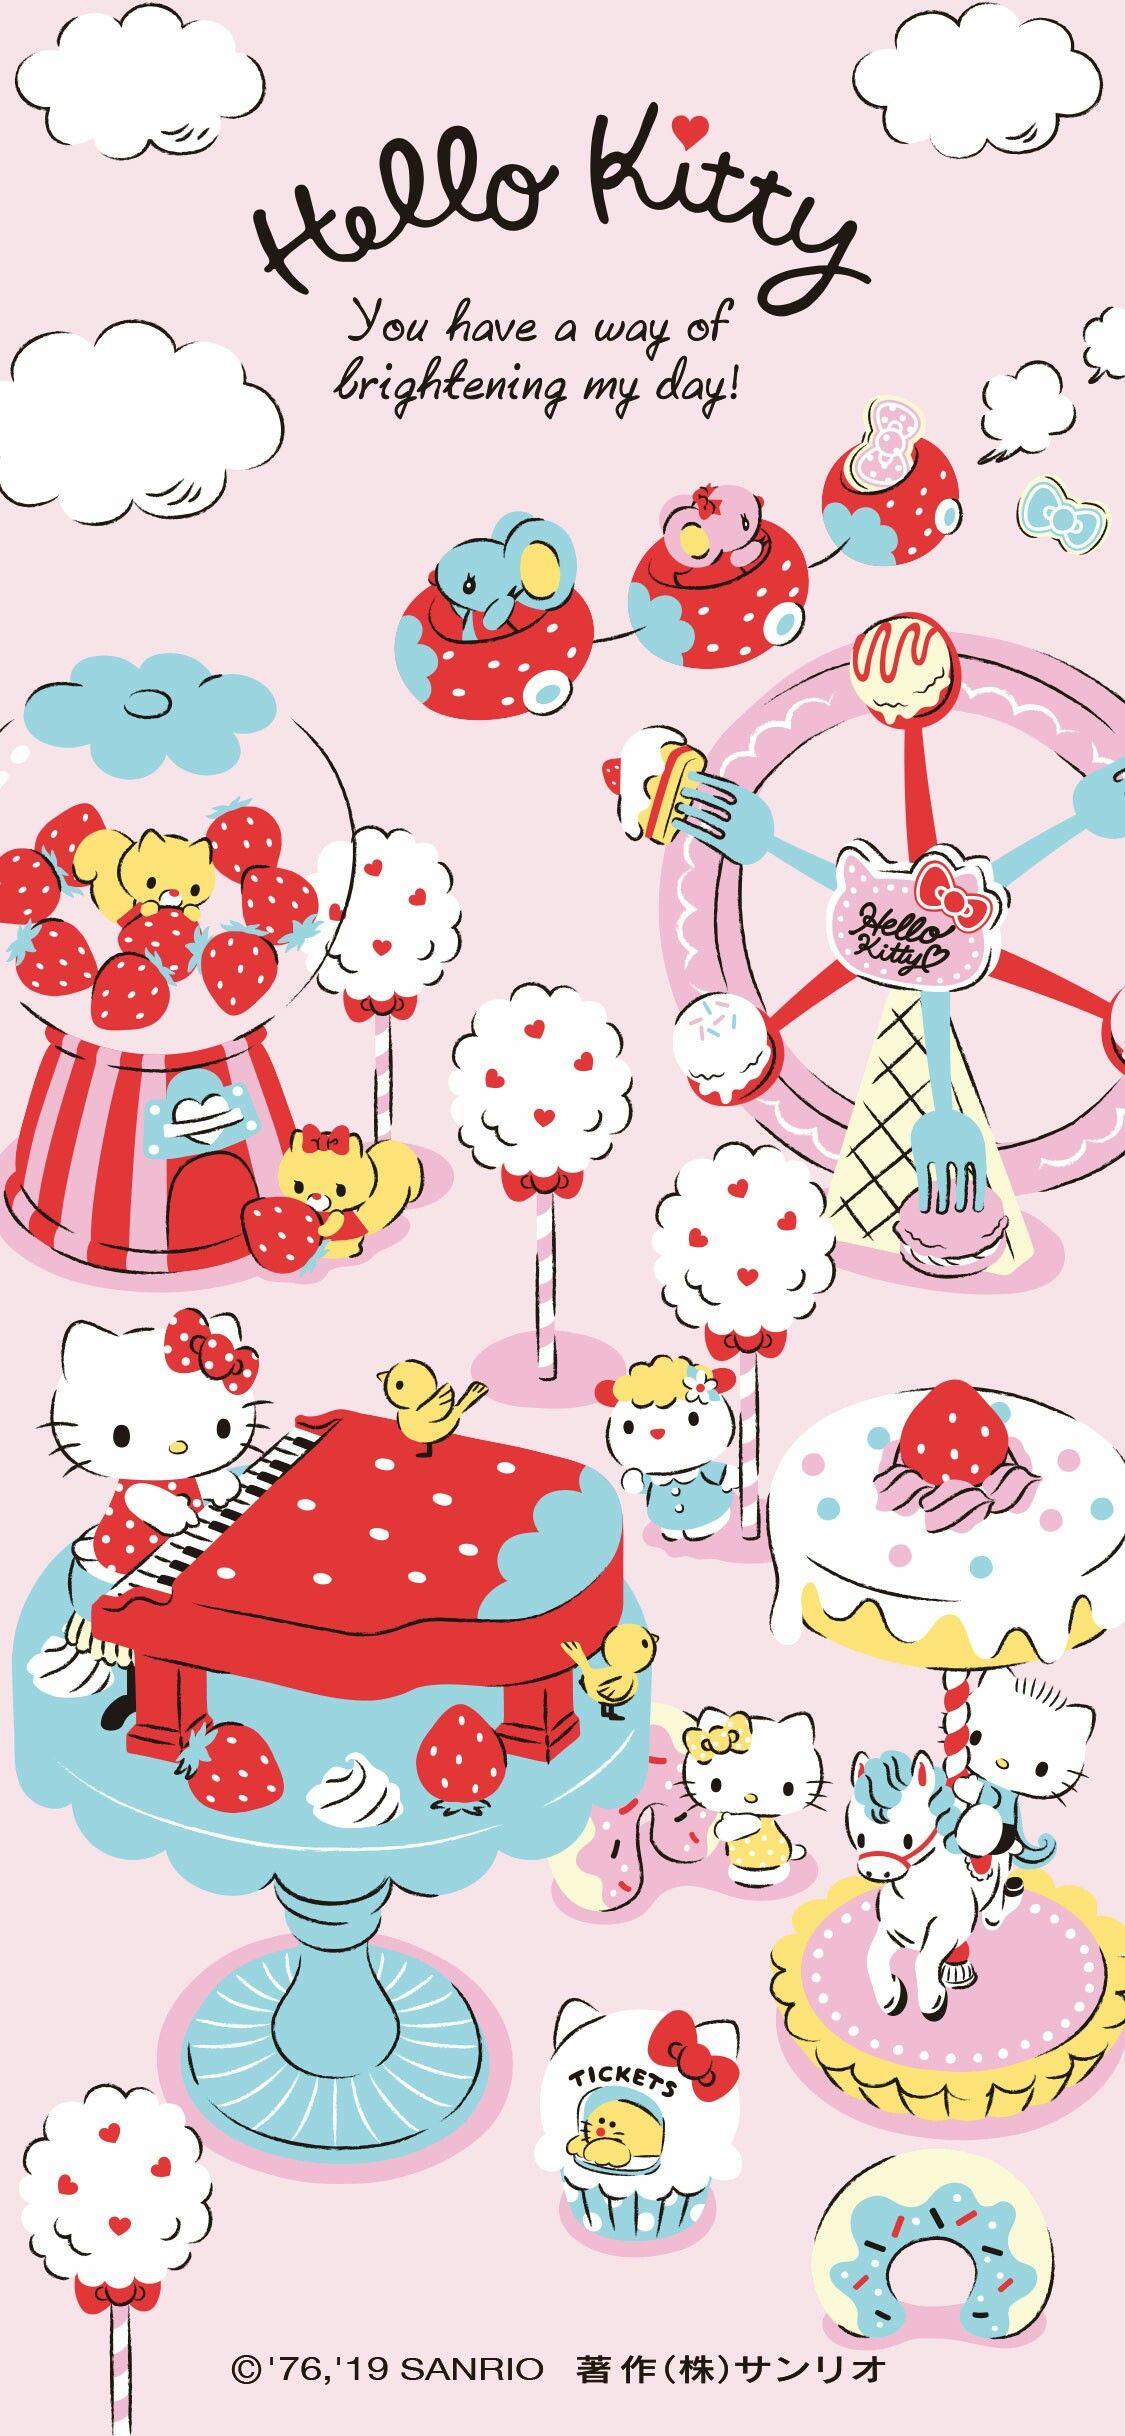 Hello Kitty Ichigo(Strawberry) theme phone wallpaper for